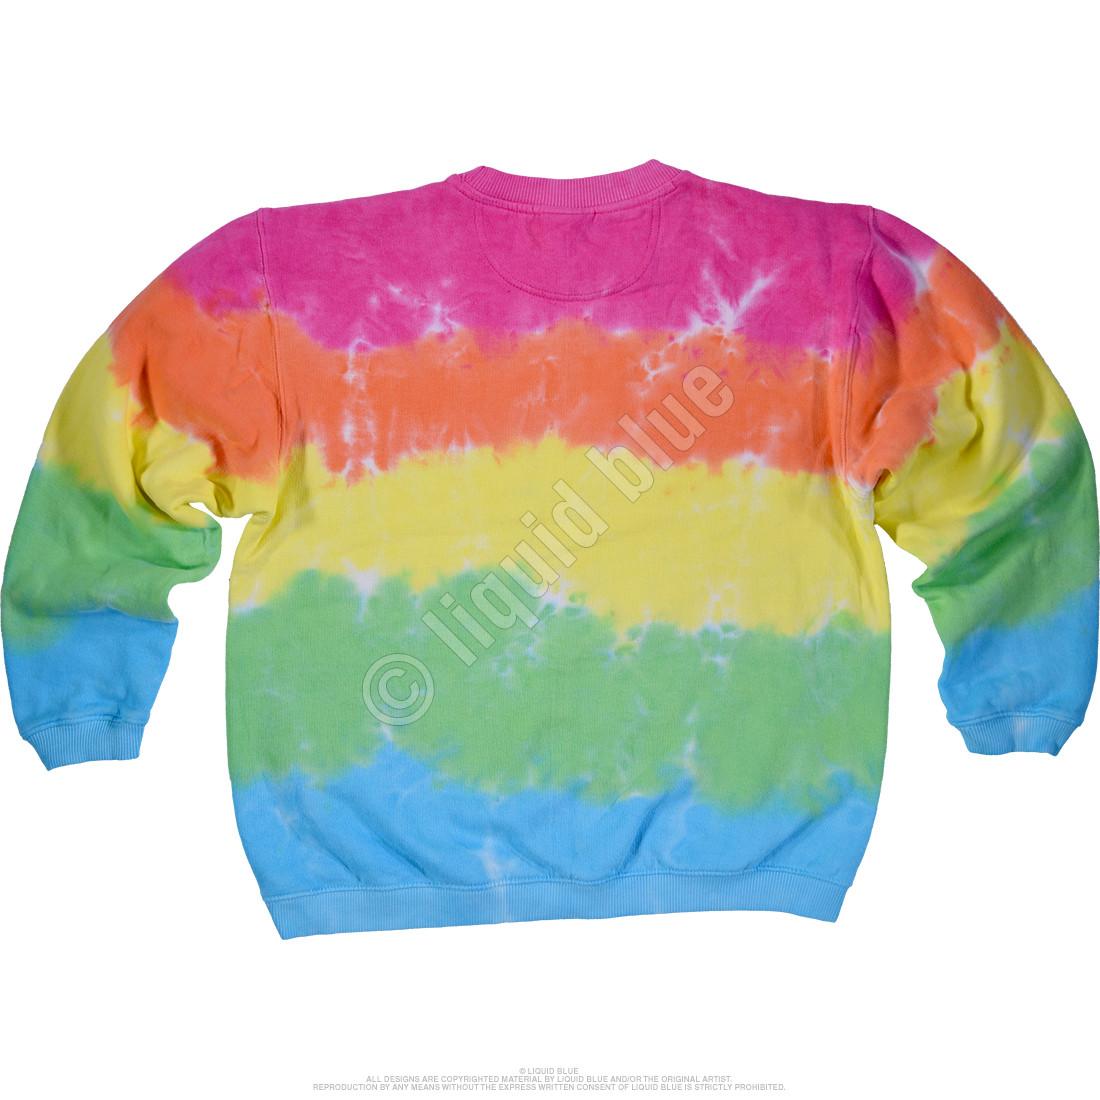 Spiral Bears Youth Sweatshirt